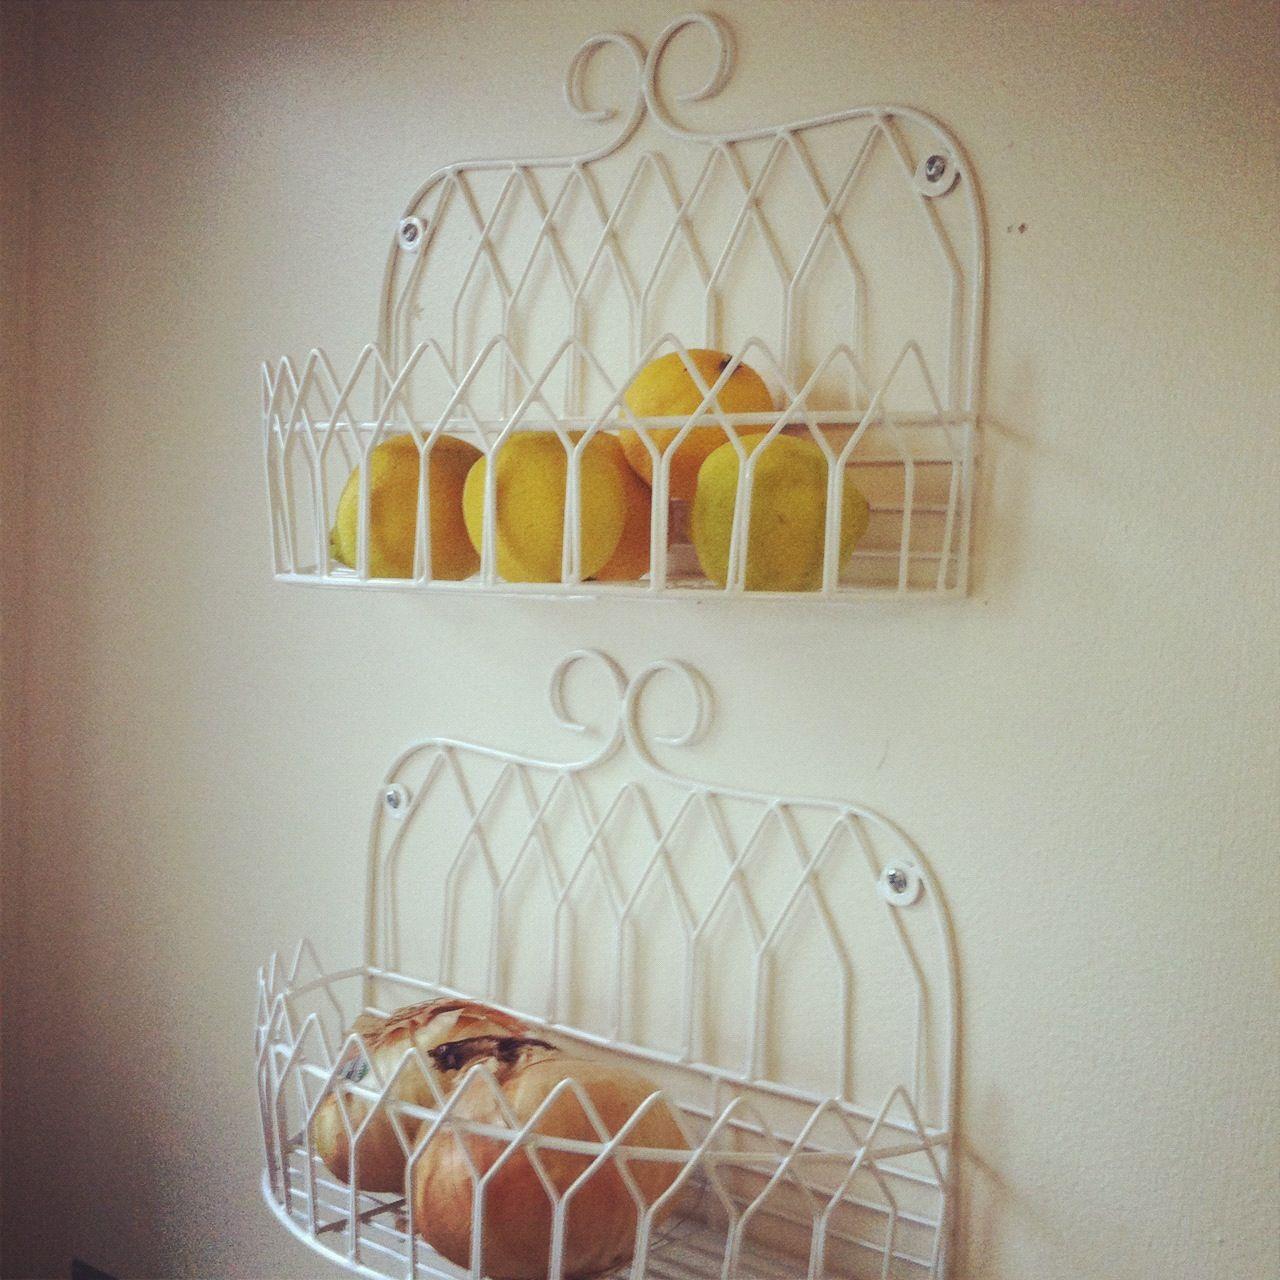 hanging basket kitchen wall storage, cute to keep fruit and veggies ...